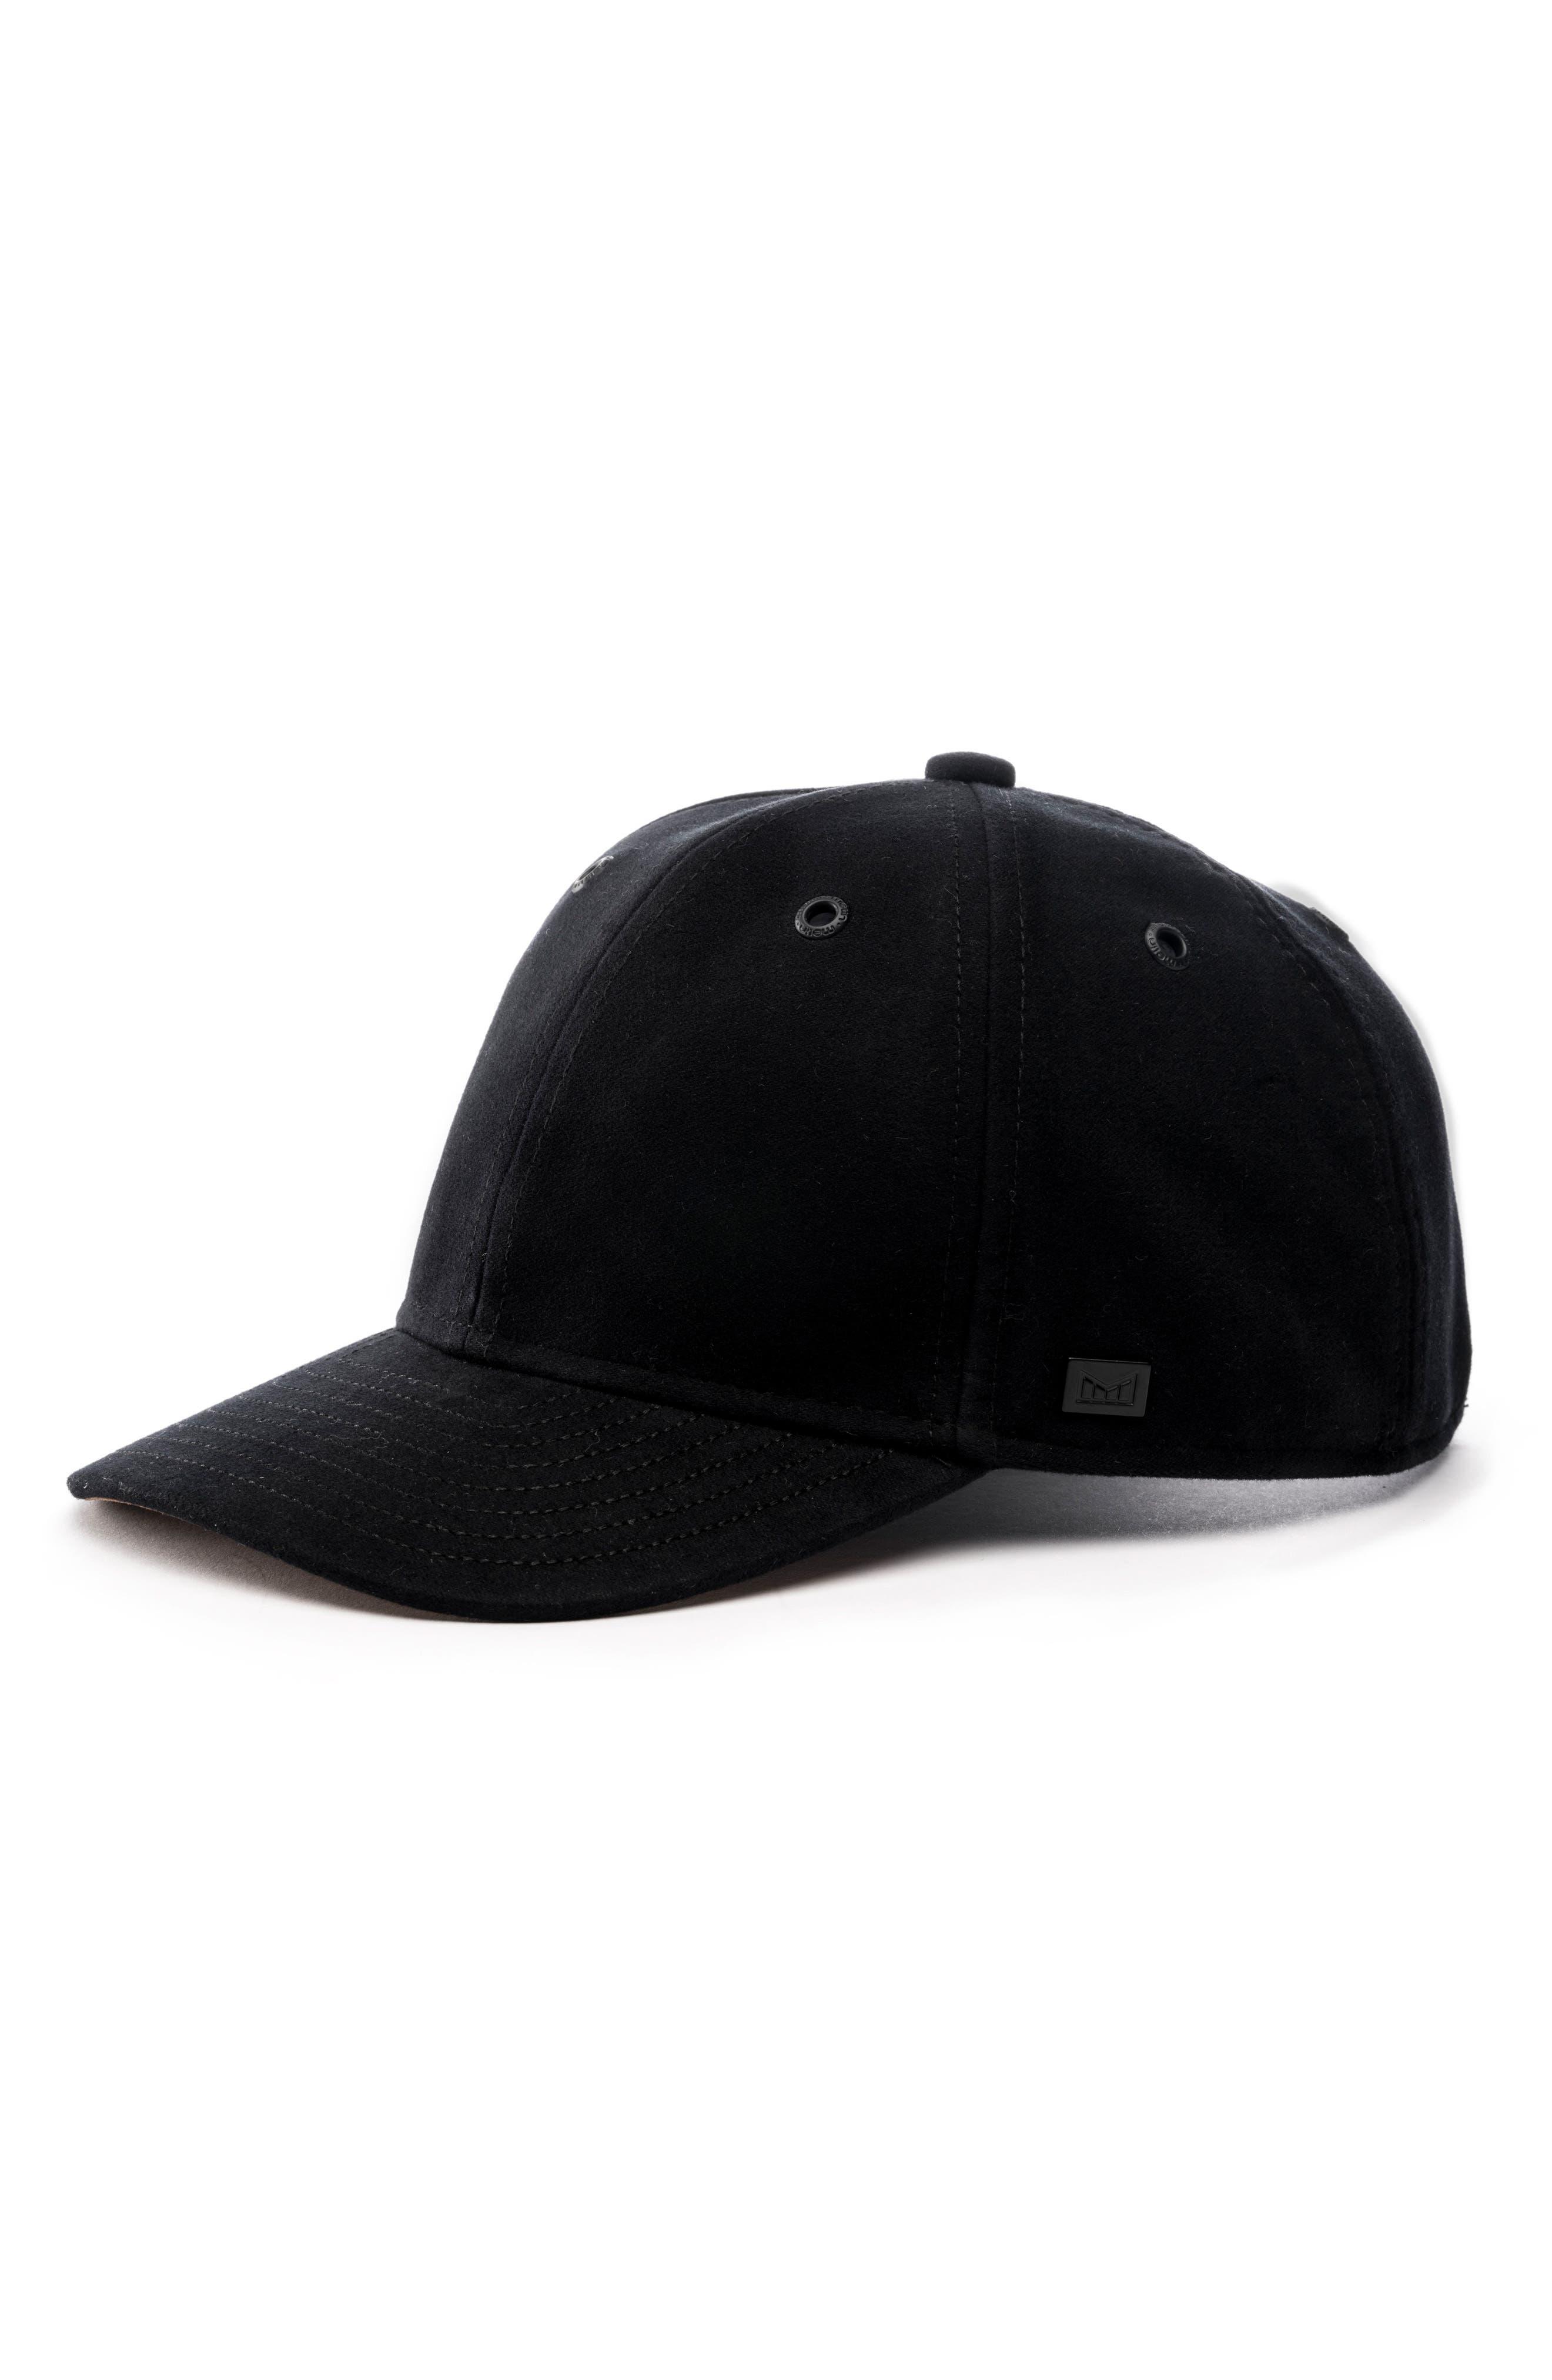 Ace Ball Cap,                             Main thumbnail 1, color,                             BLACK